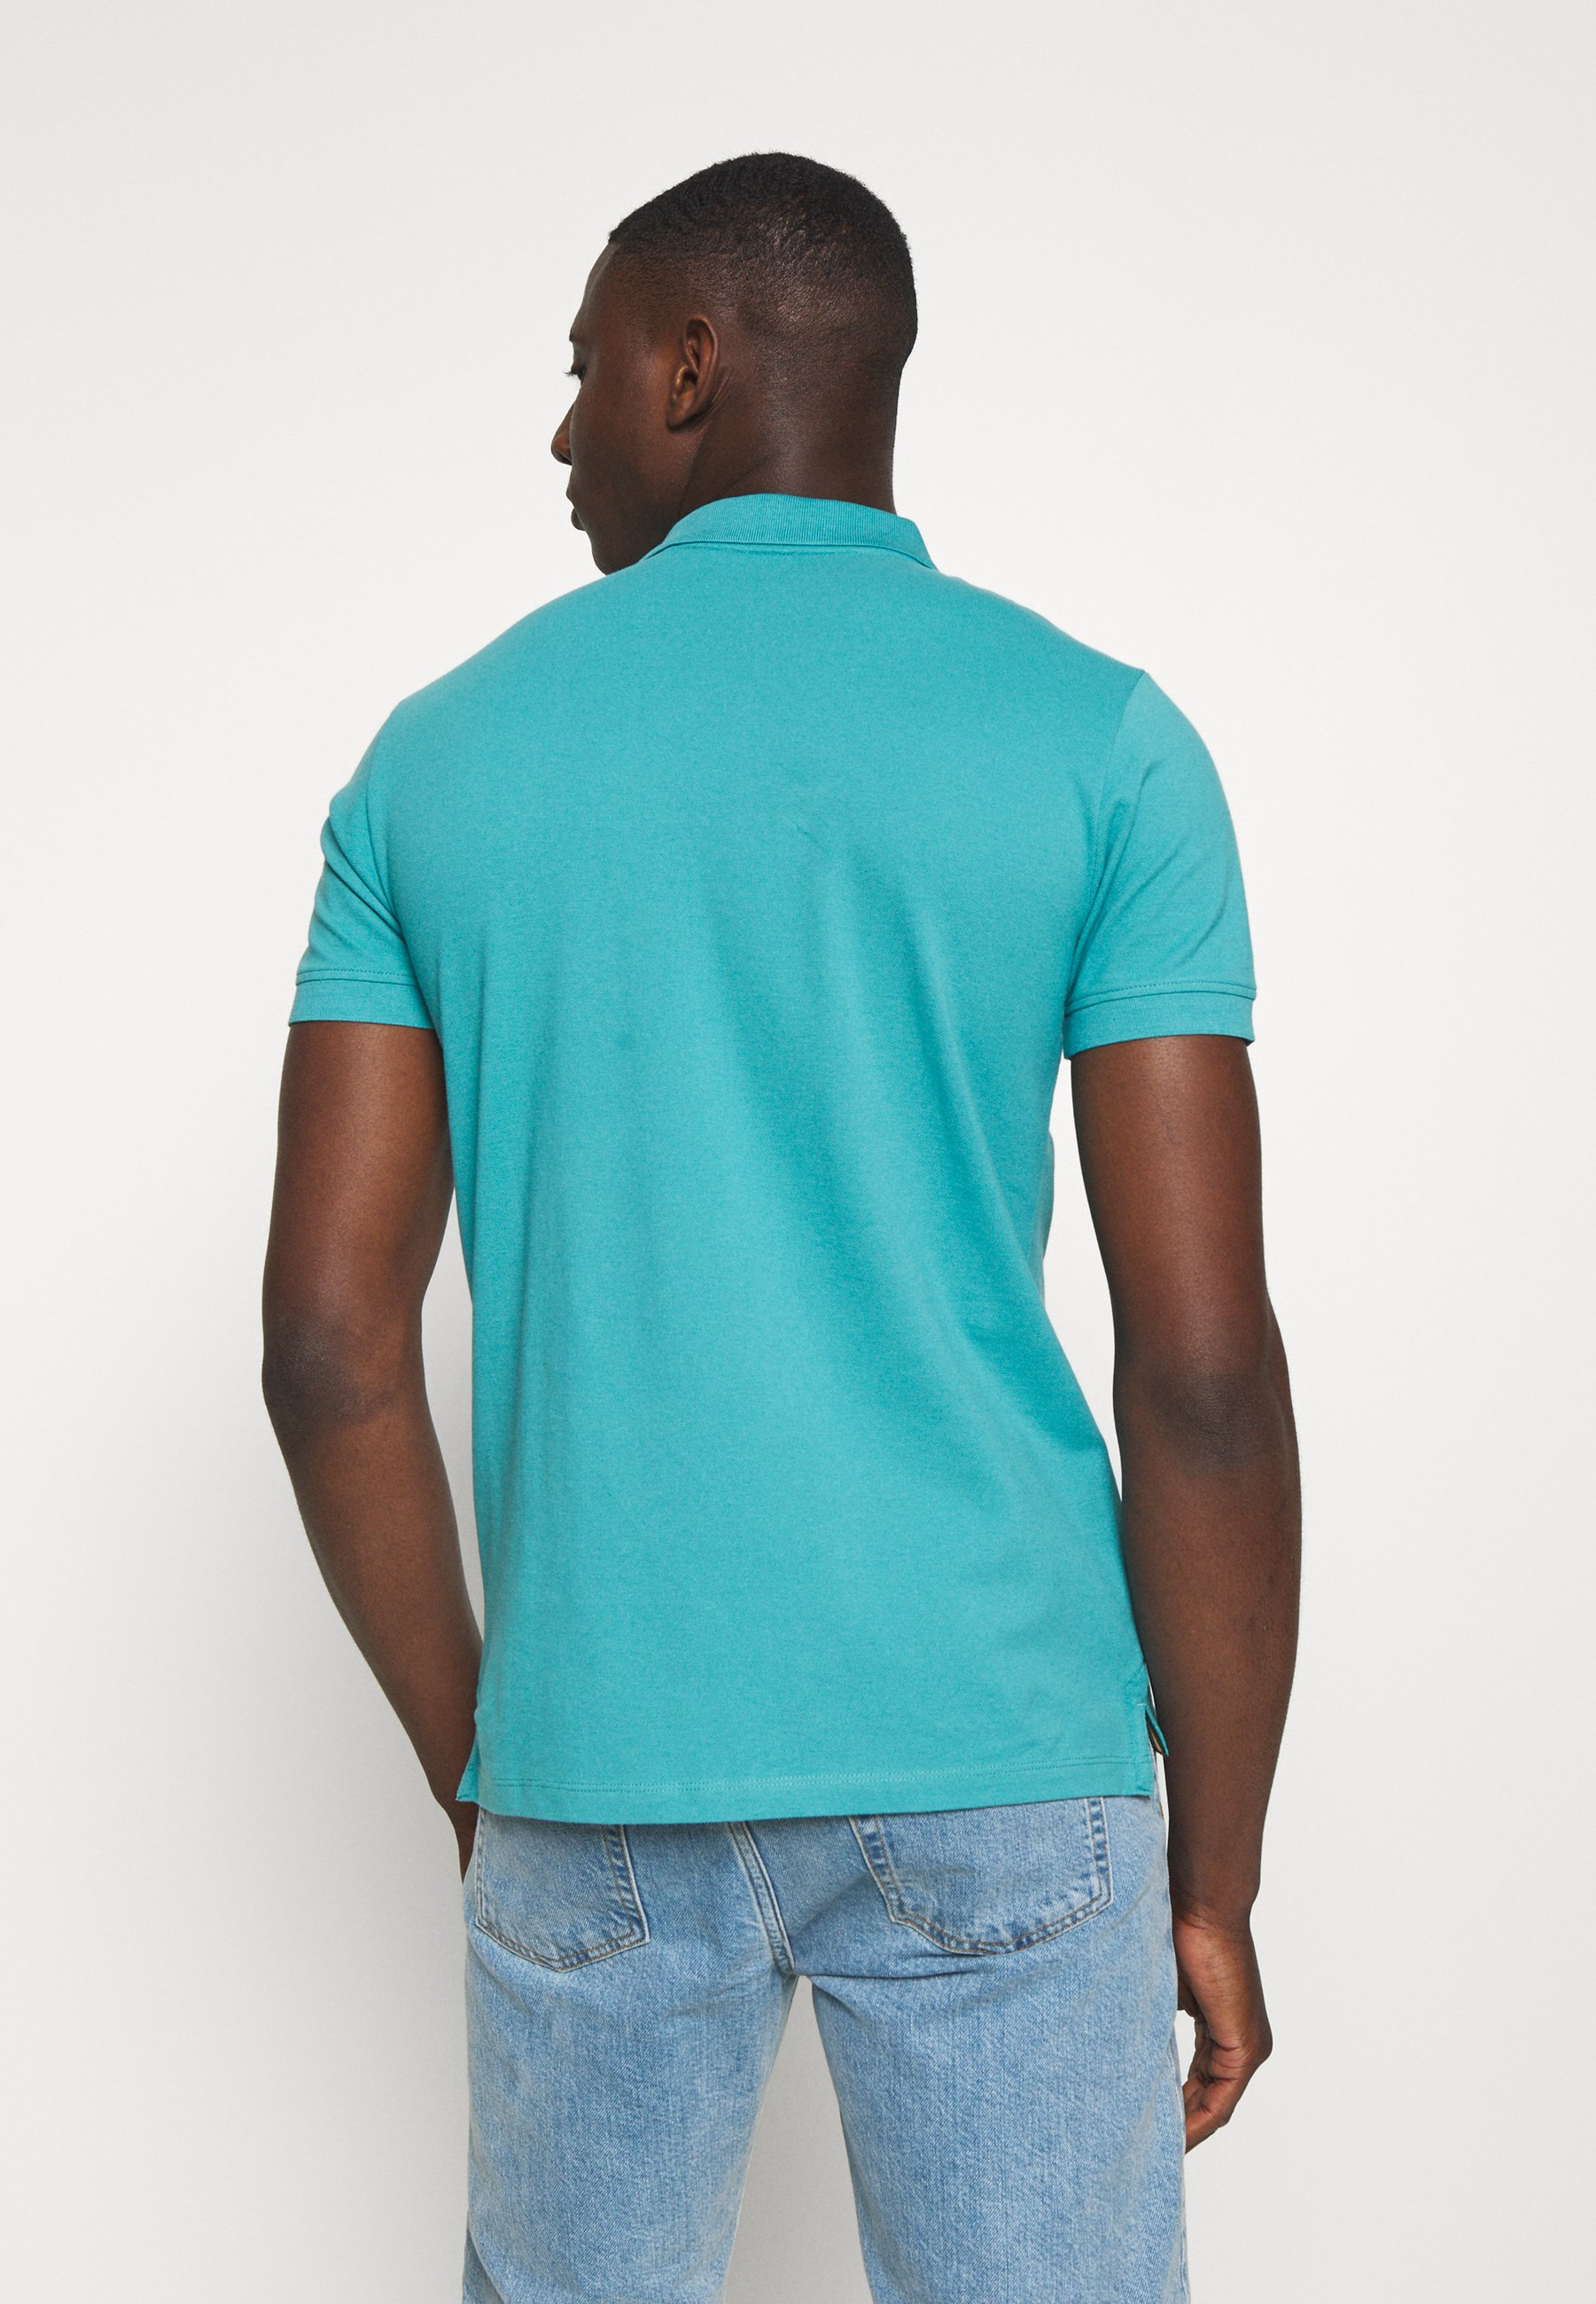 Esprit Polo shirt - teal blue 1KE9E